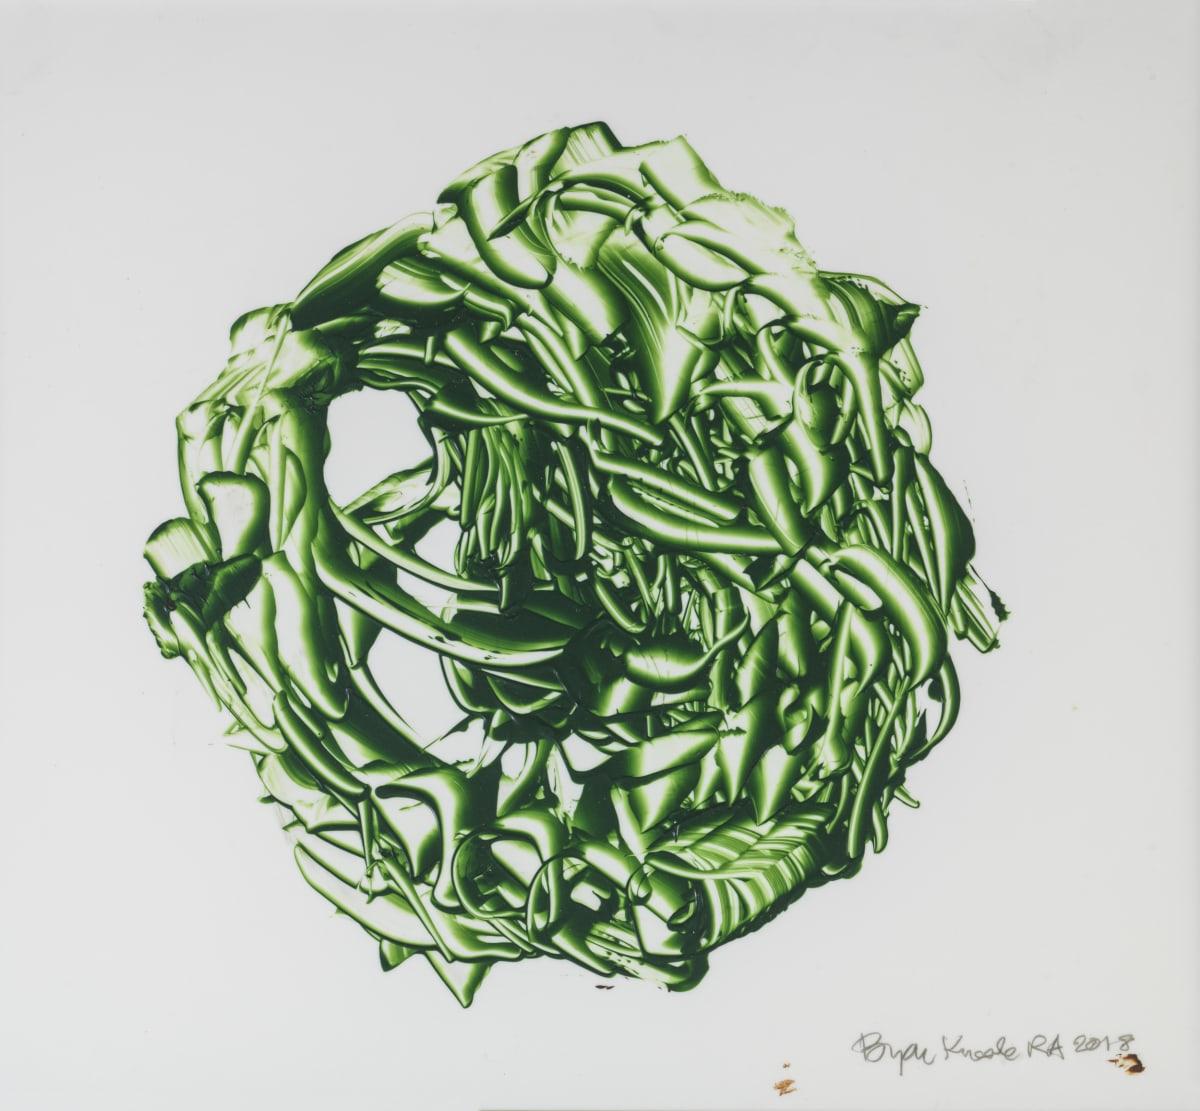 Bryan Kneale, Dark Green Sphere, 2018